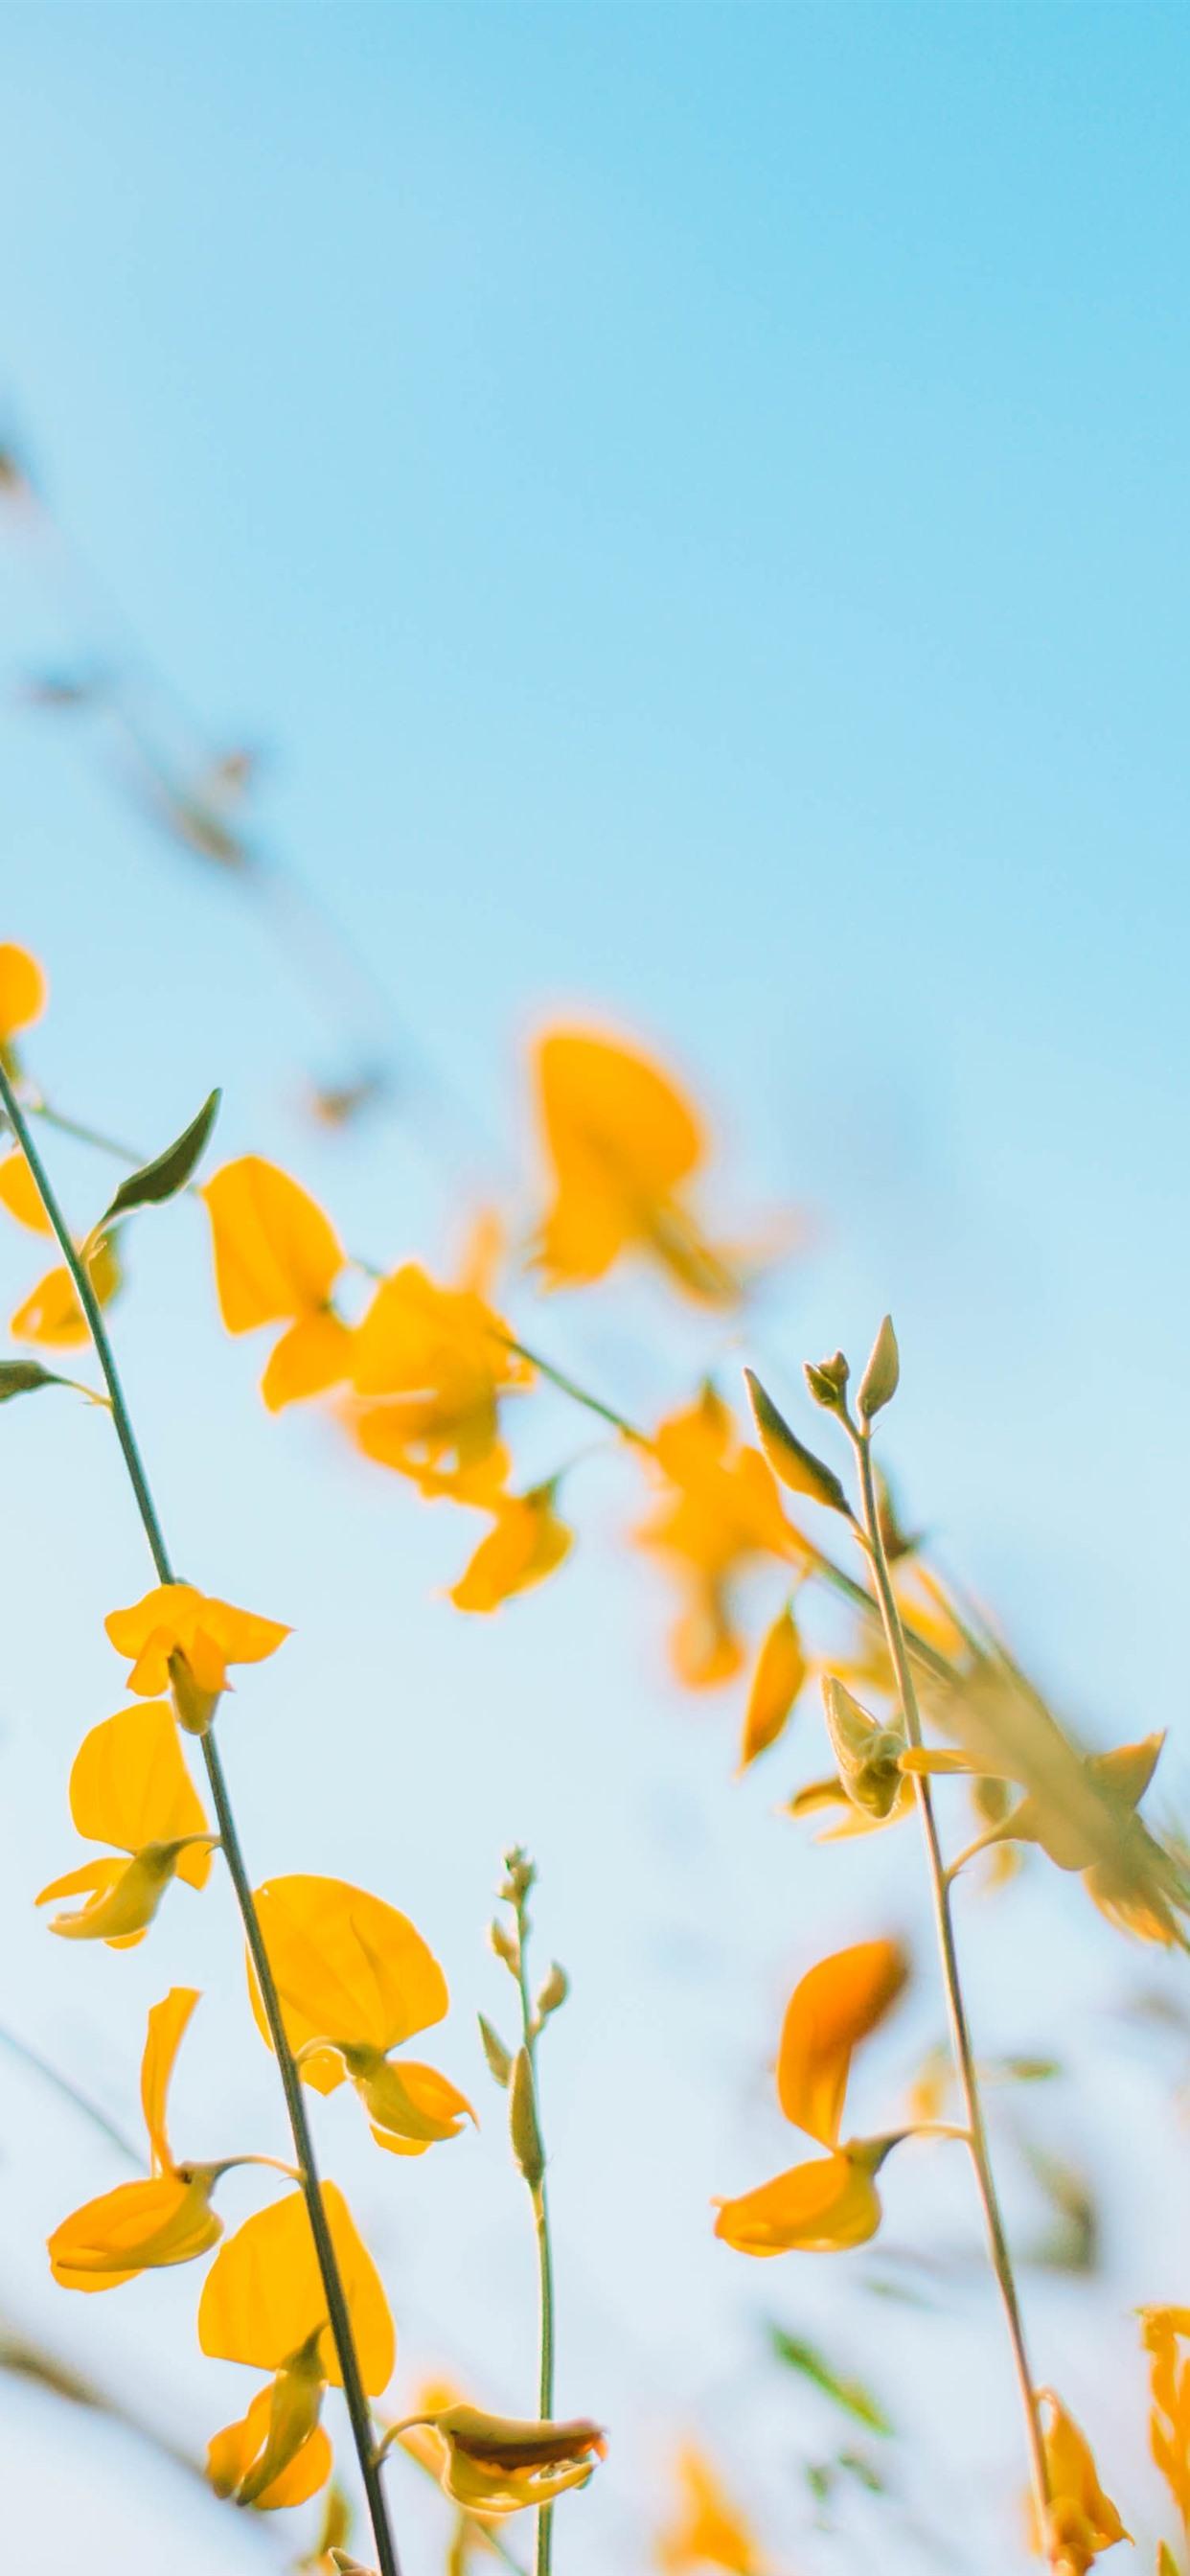 iphone yellow flower background 1242x2688 wallpaper teahub io teahub io